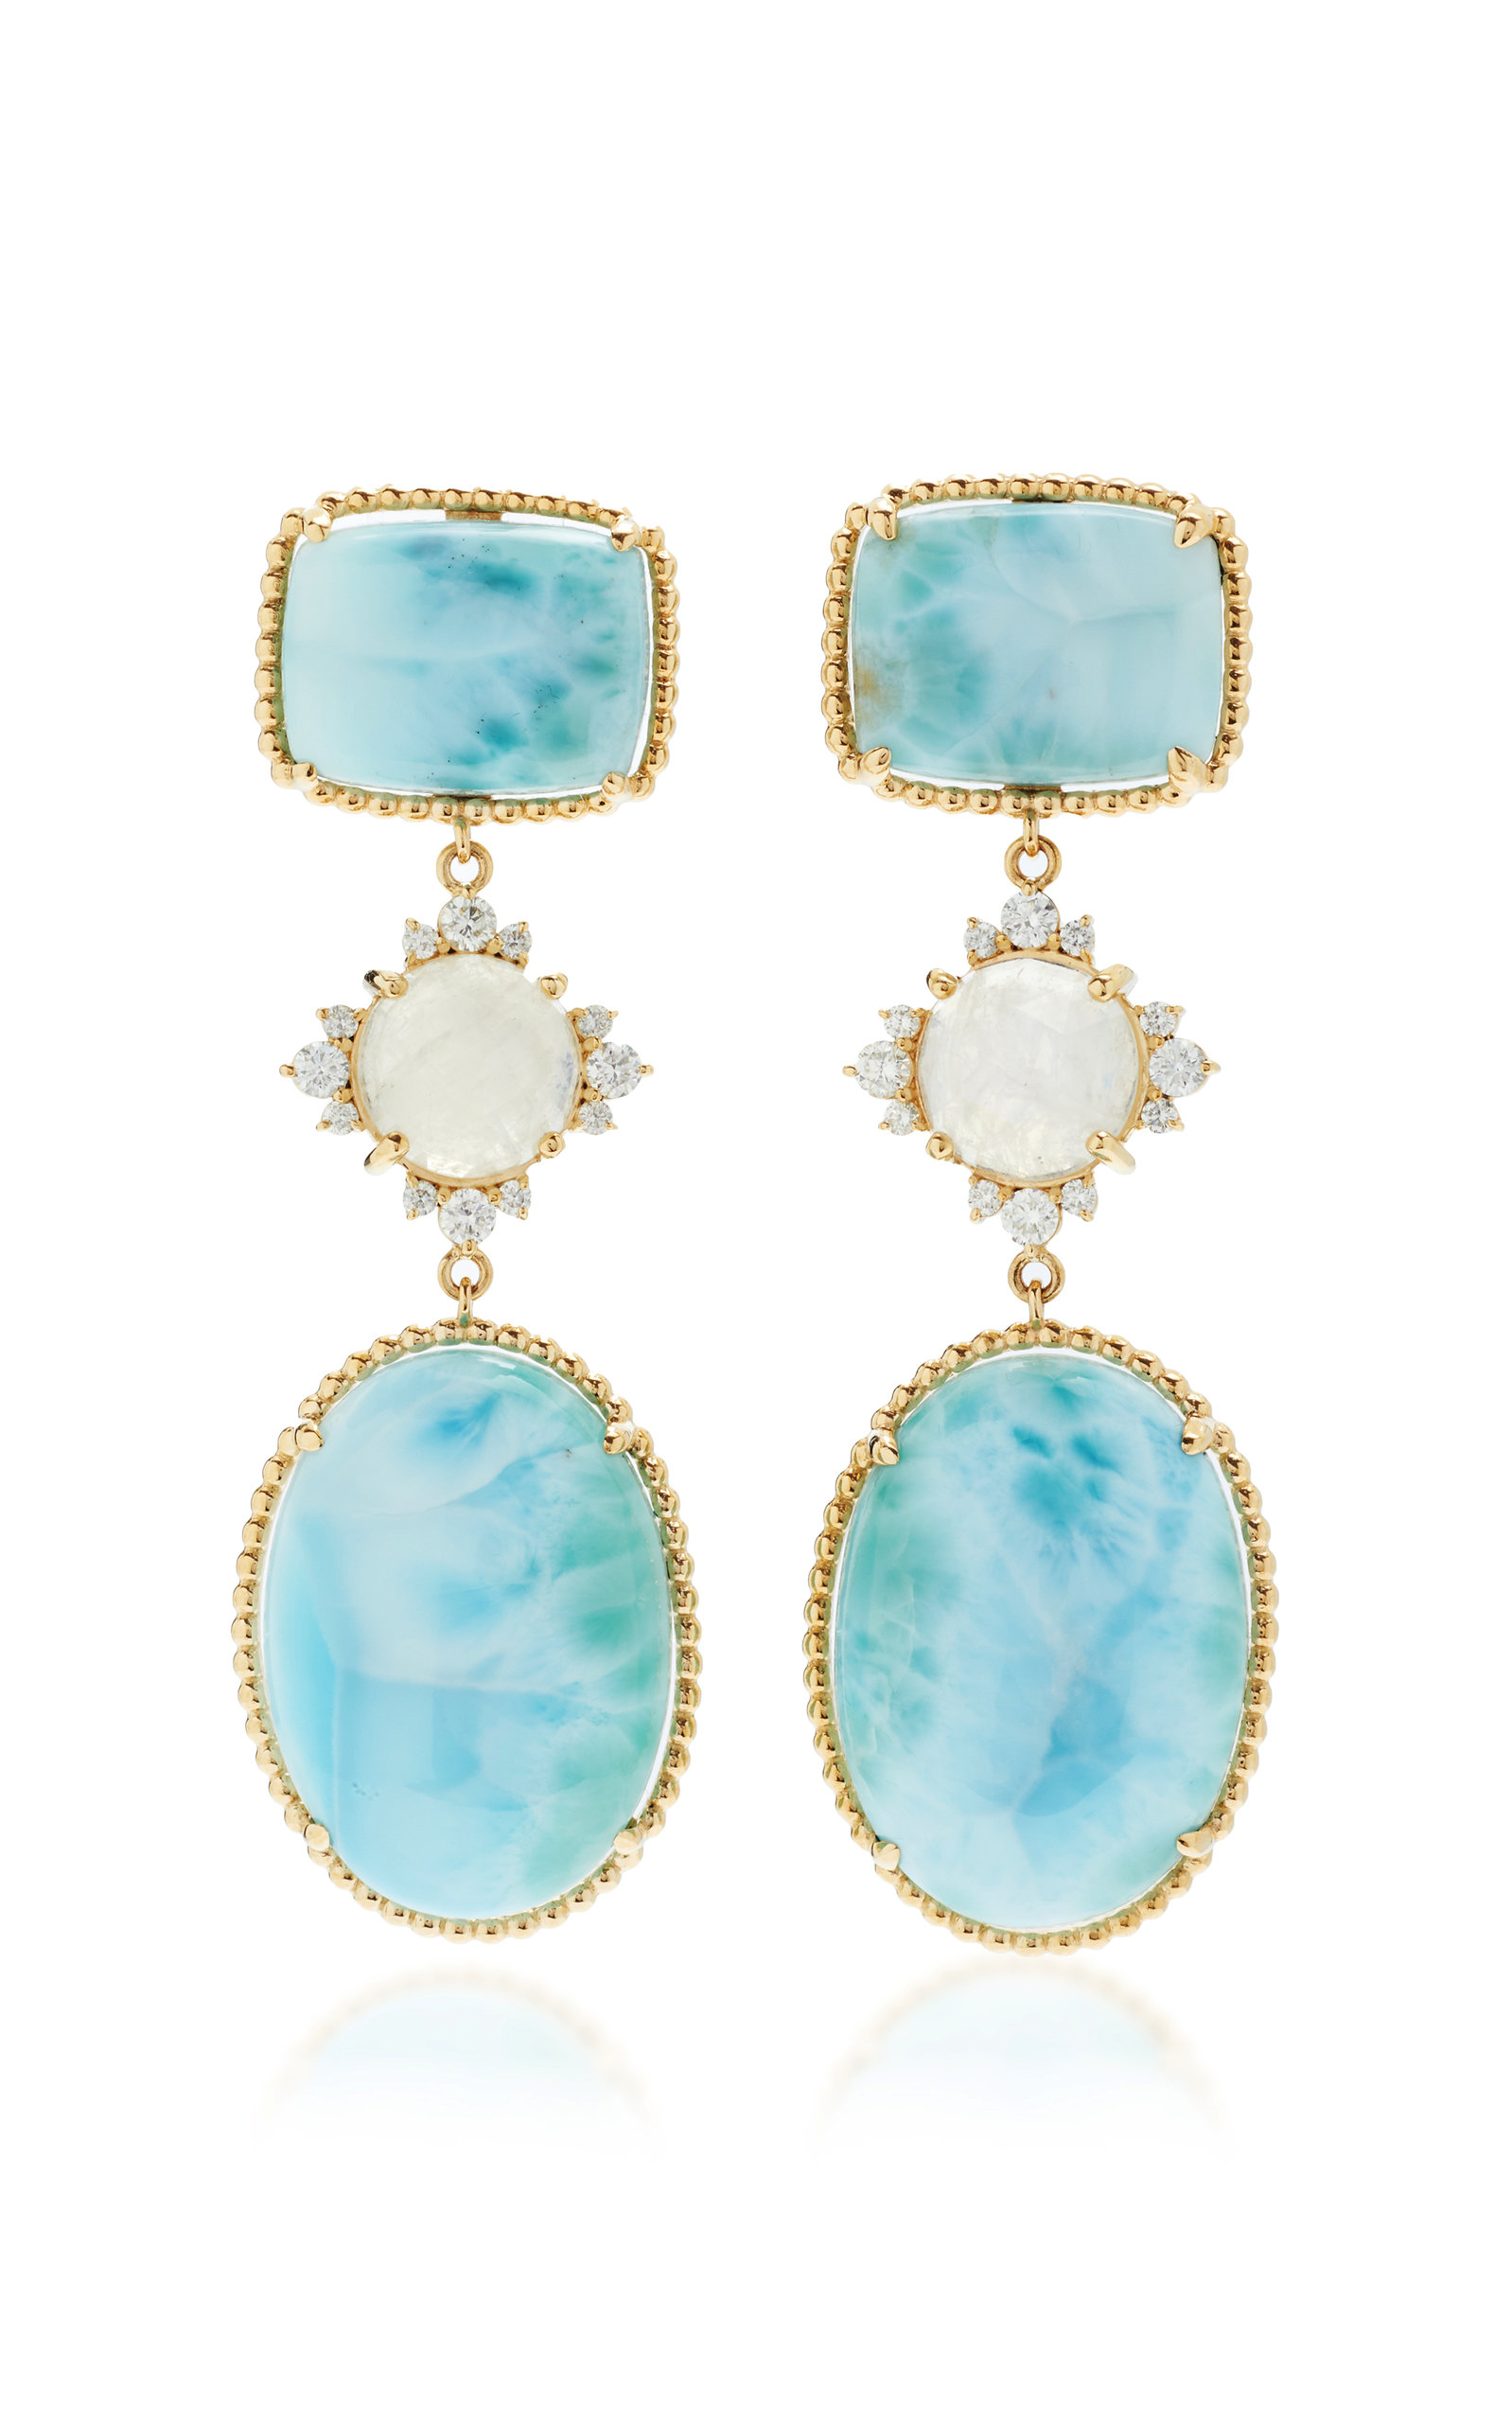 Women's 14K Yellow Gold Larimar; Moonstone and Diamond Earrings